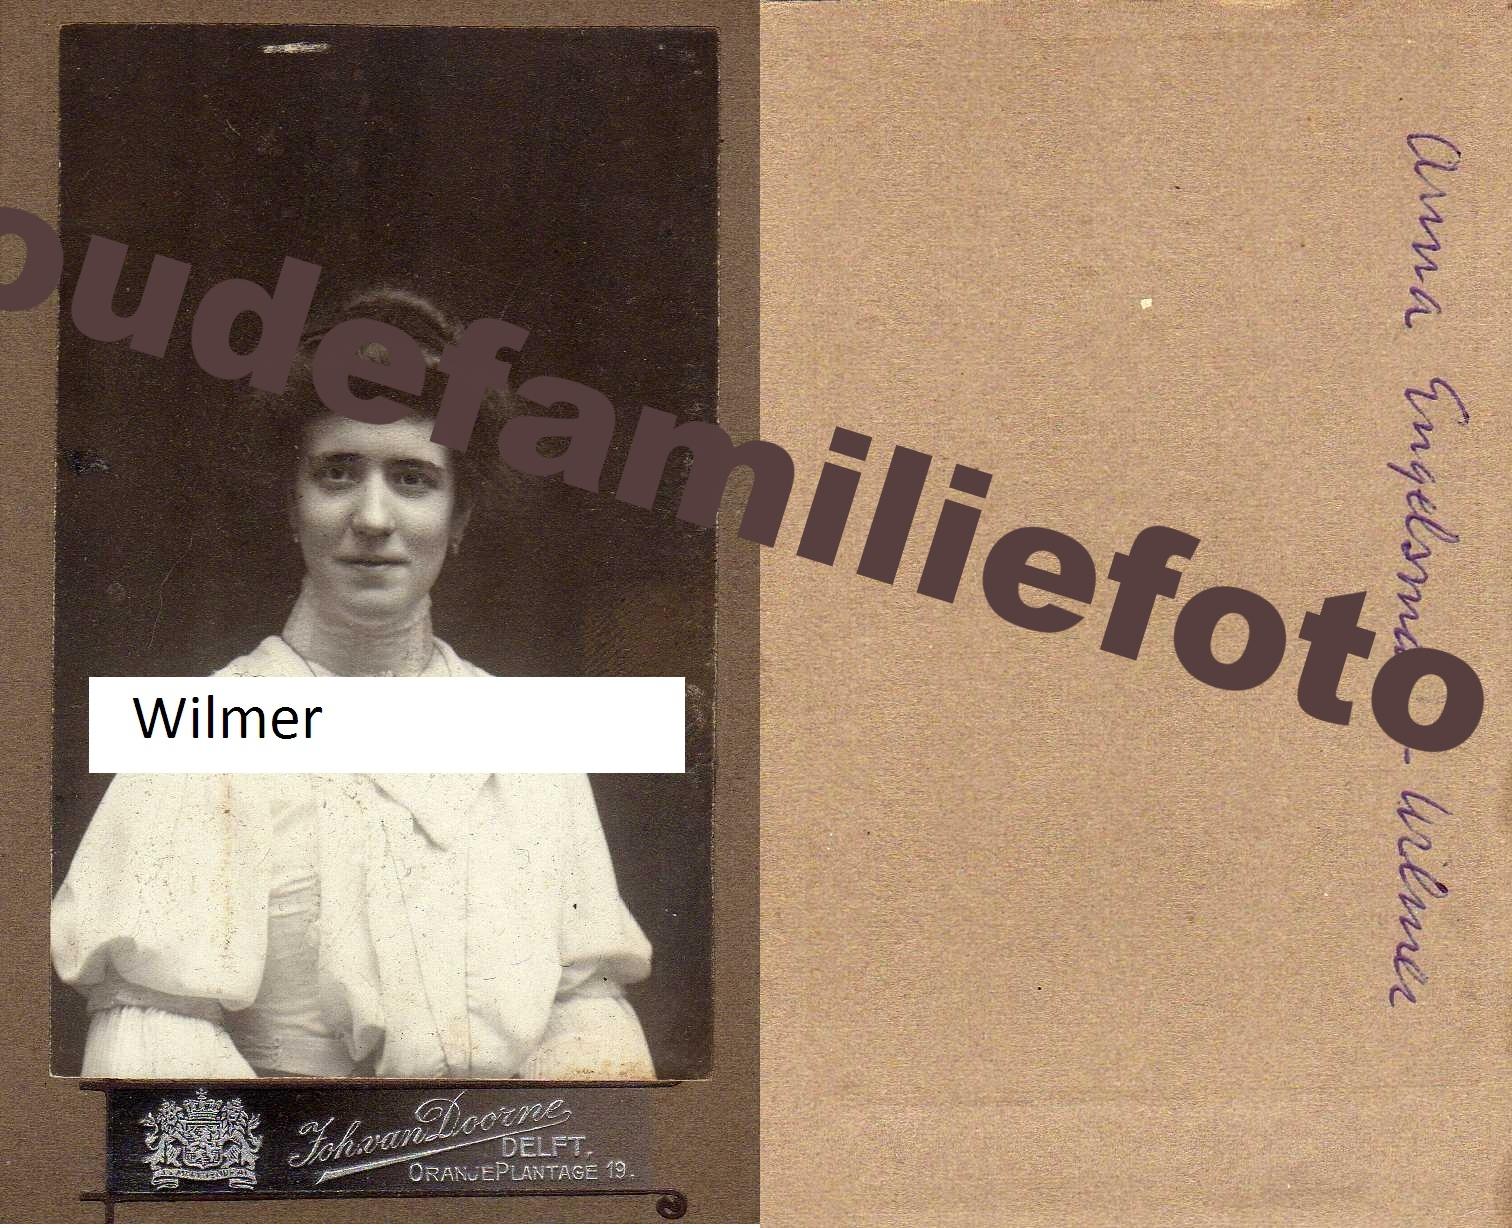 Wilmer, Anna Agnes Wilhelmina geb: 14-10-1888 Delft. Getrouwd met Johannes Andreas Engelsman € 3.50